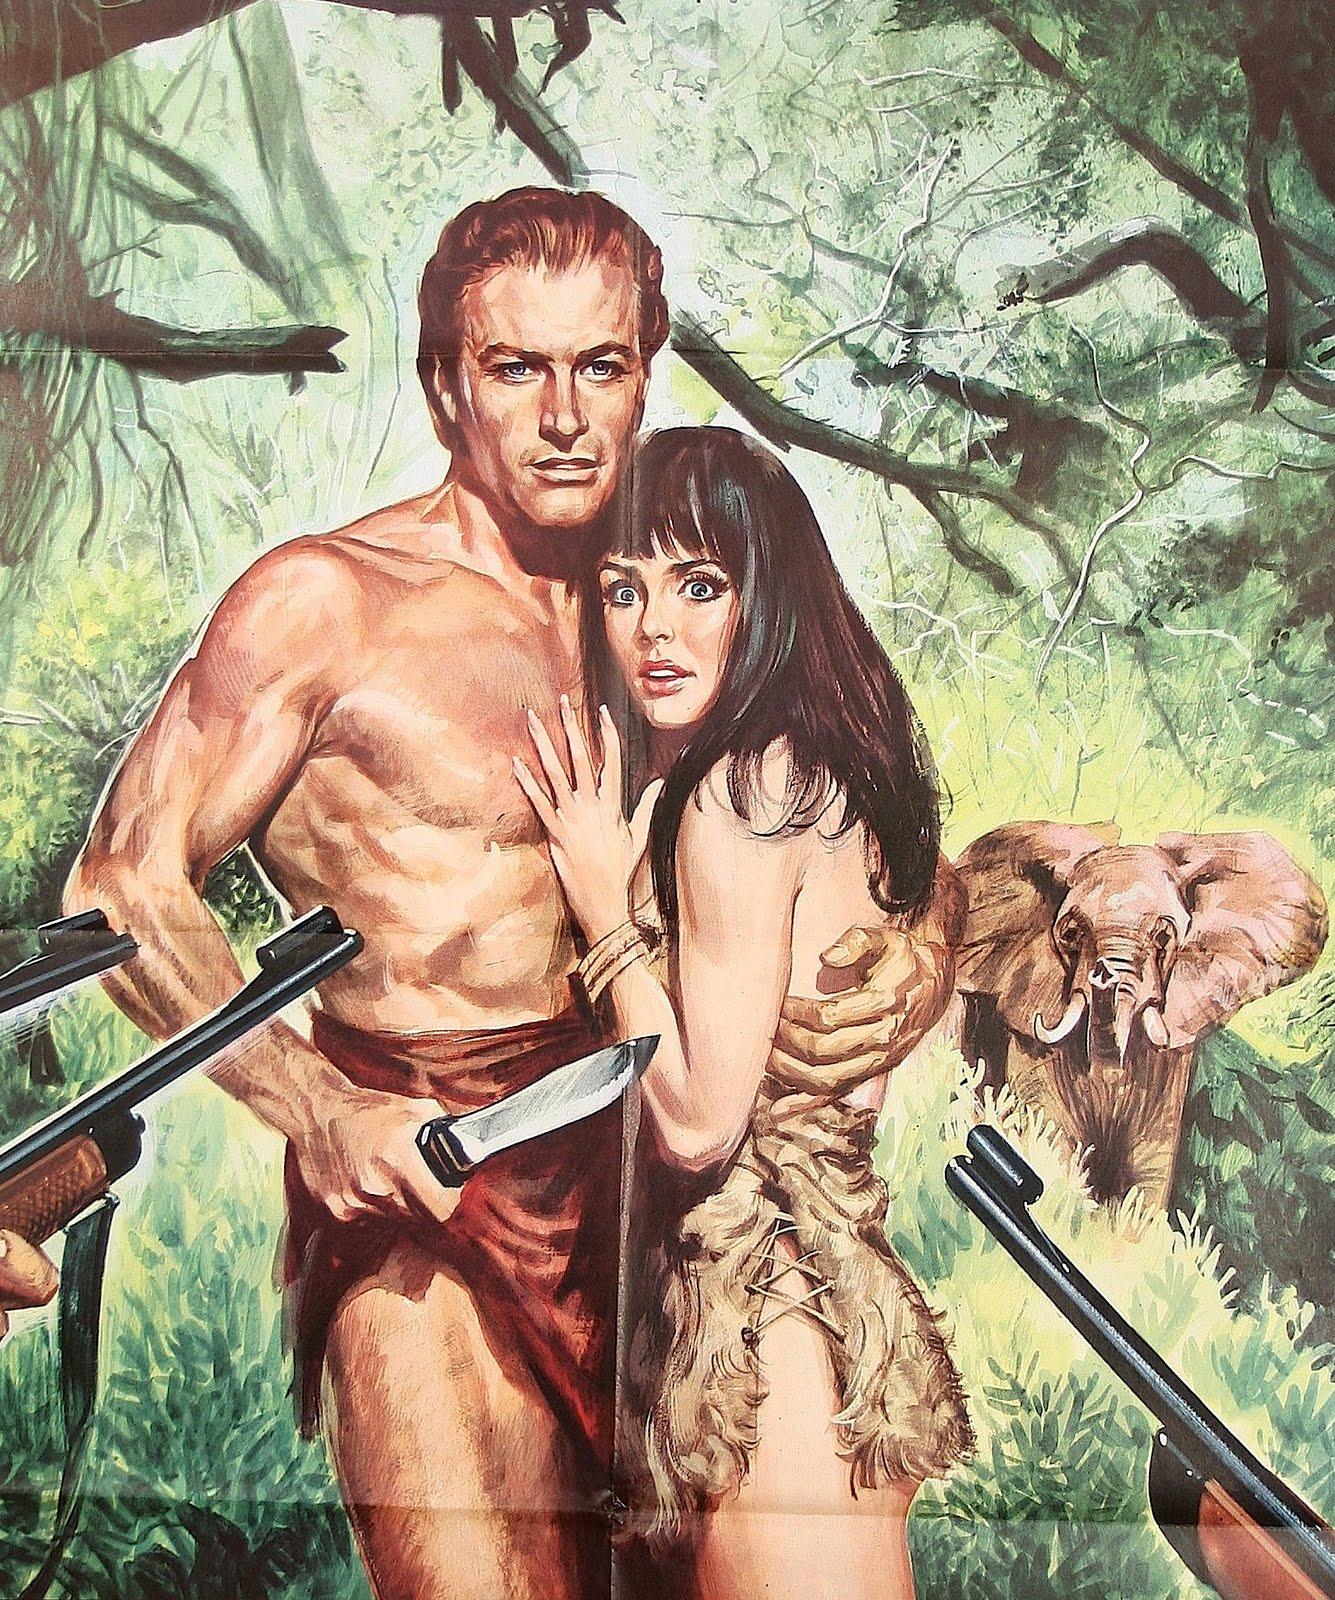 Tarzan%252B %252BPoster%252BLex%252BBarker free porn cartoon free 3d porn galleries from   3dlovedolls, 3dshemales and ...